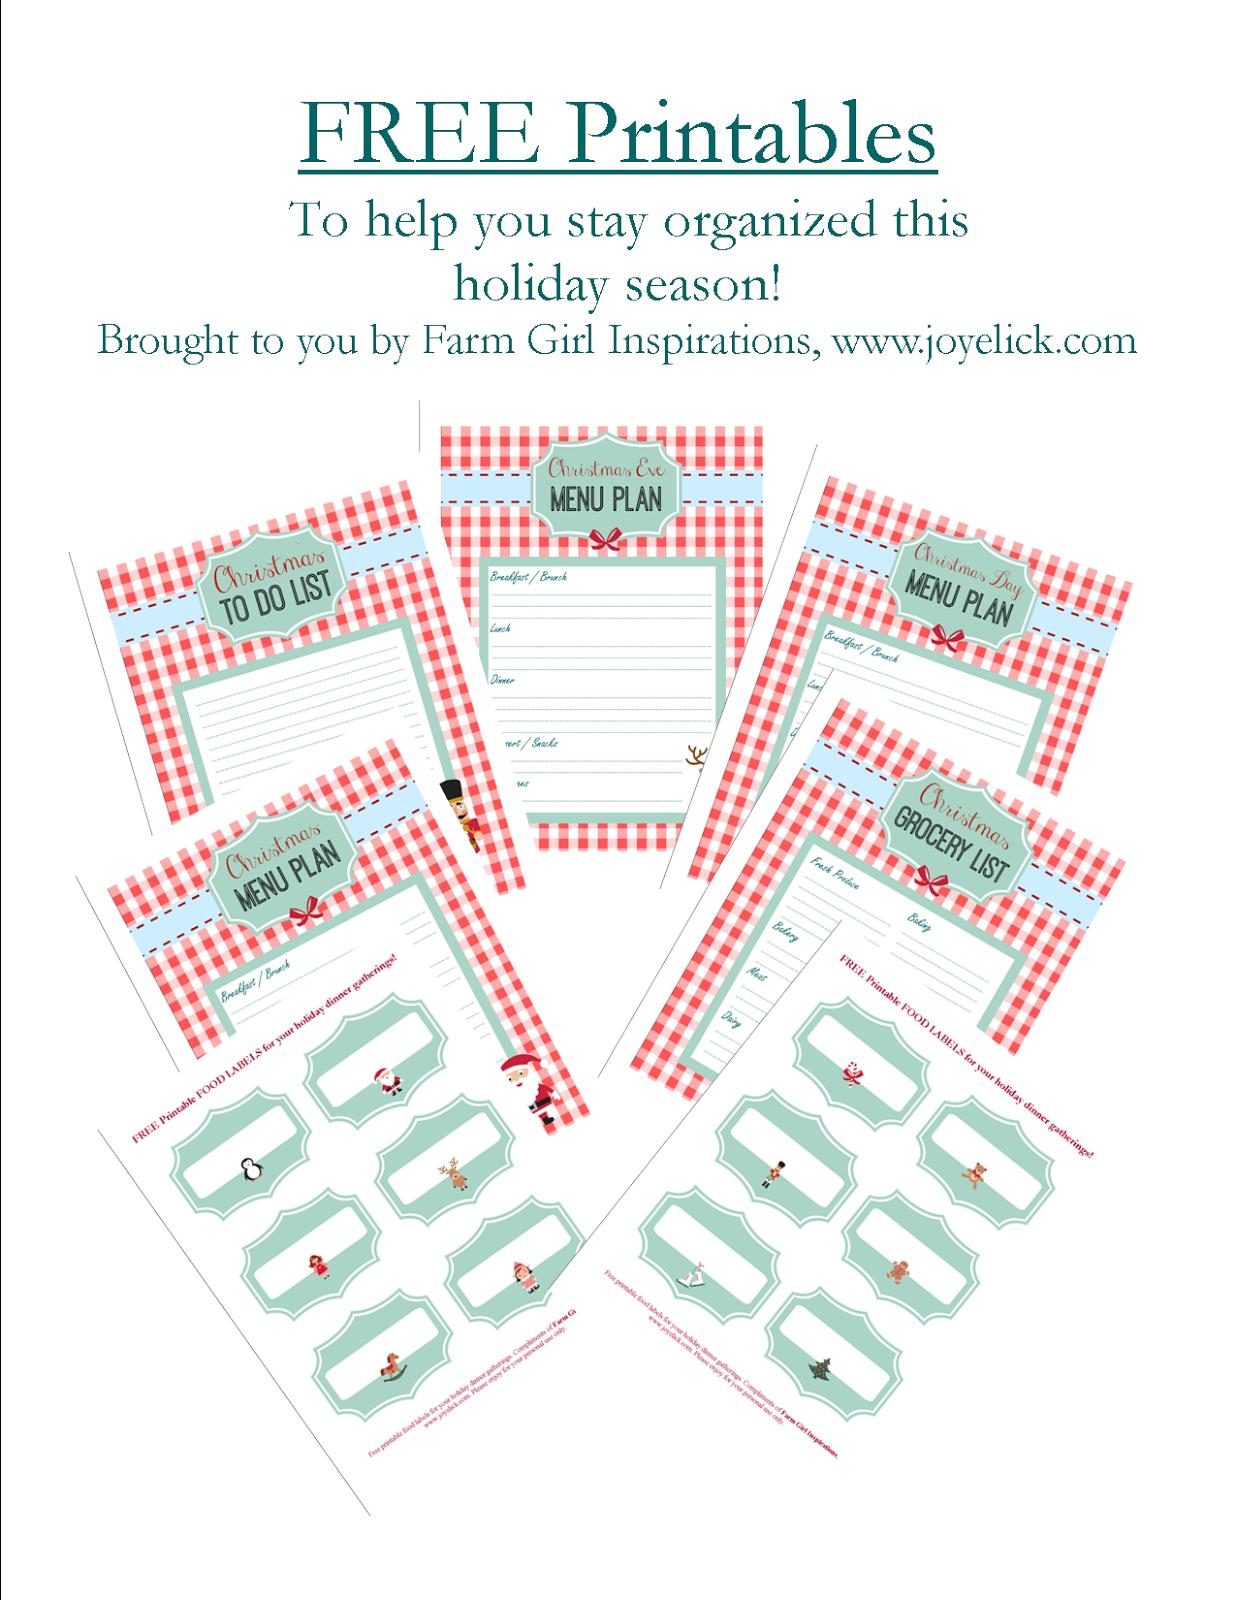 Free Printable Christmas Planner Set Stay Organized This